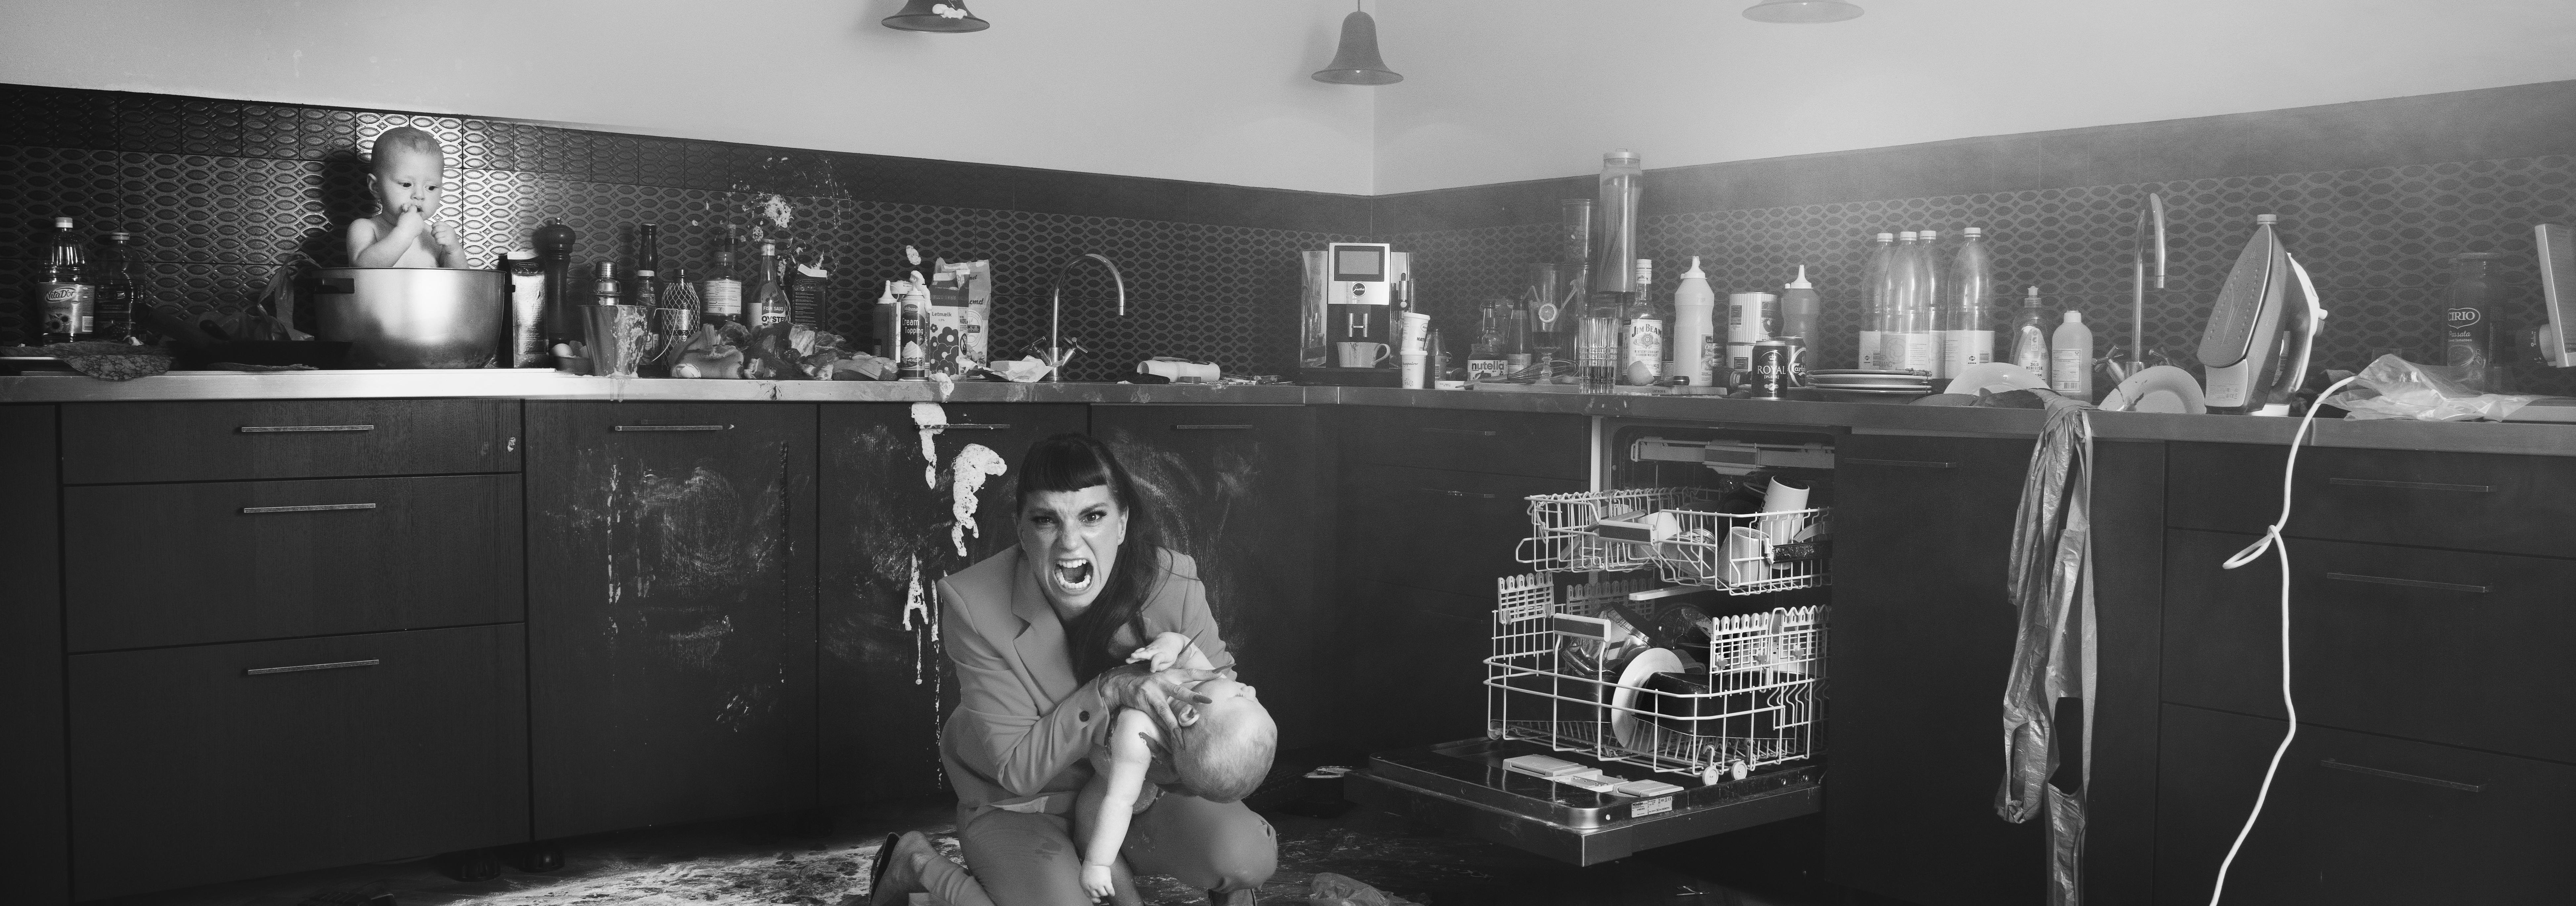 The Female Gaze. Fotograf: Karoline Lieberkind